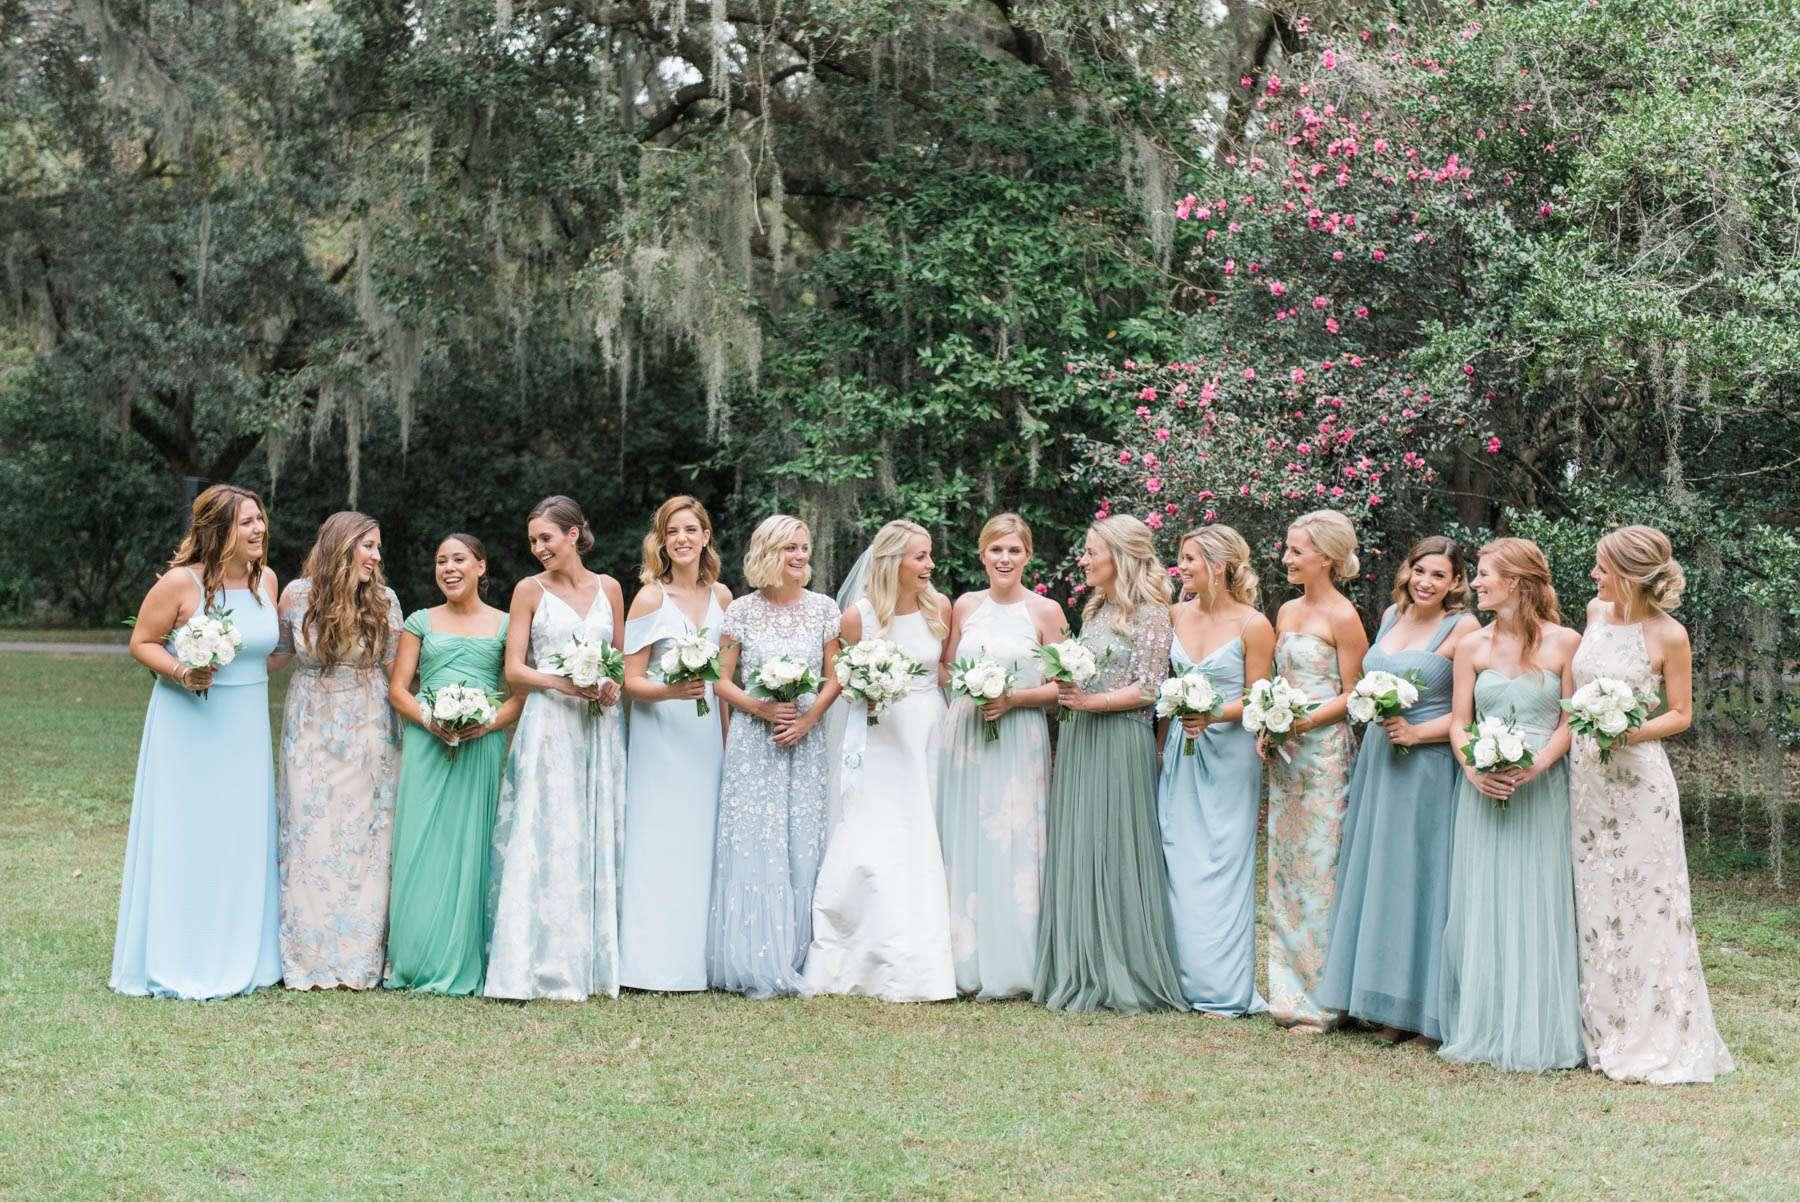 Bridesmaids and Bride, Jillian Attaway, on Wedding Day in Charleston / Jillian Attaway of Rhyme & Reason's Charleston Wedding on Southern Weddings